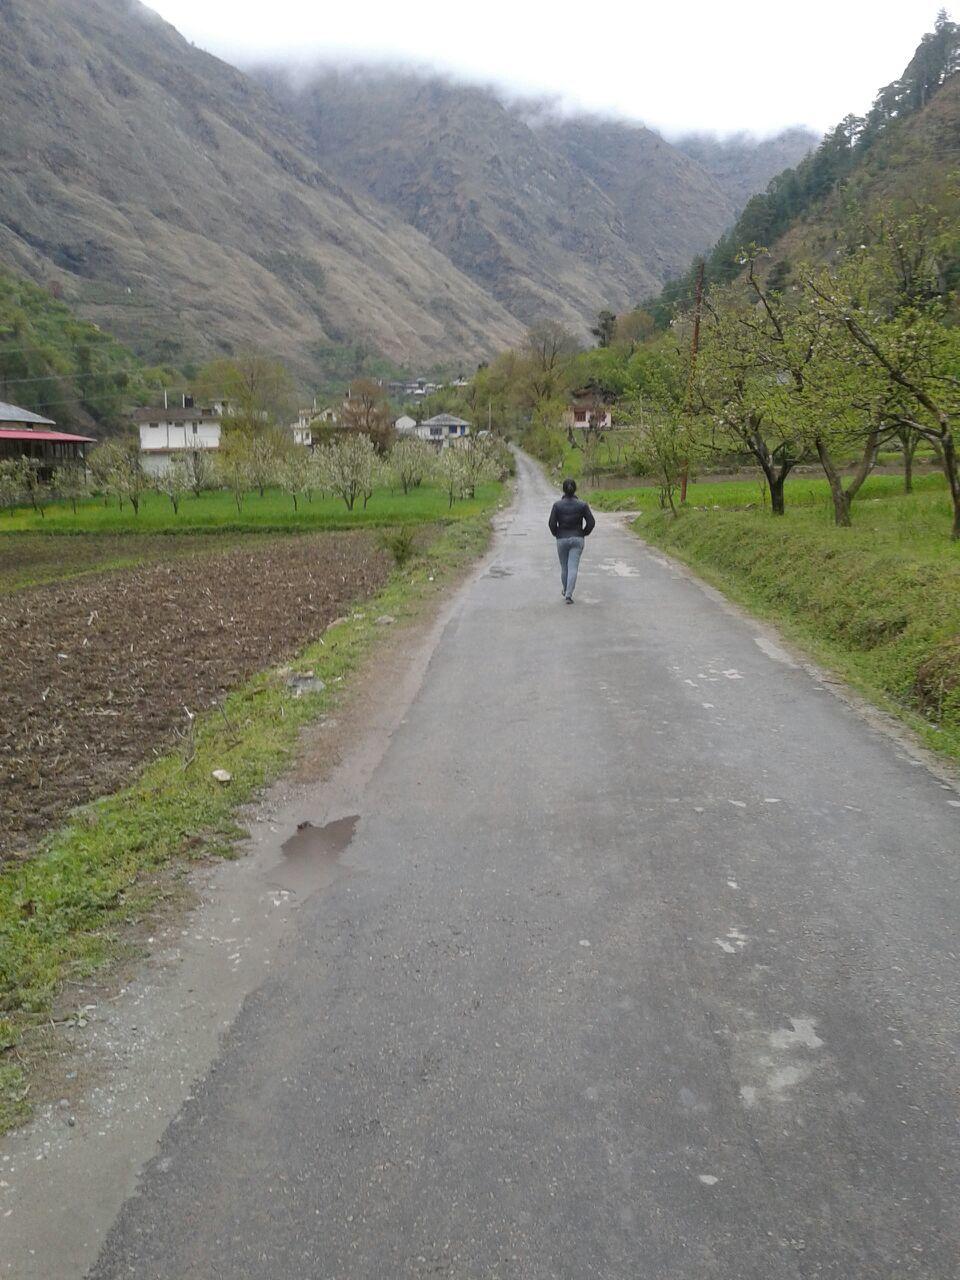 Photos of Solitude in Tirthan 1/4 by Geetika Gupta